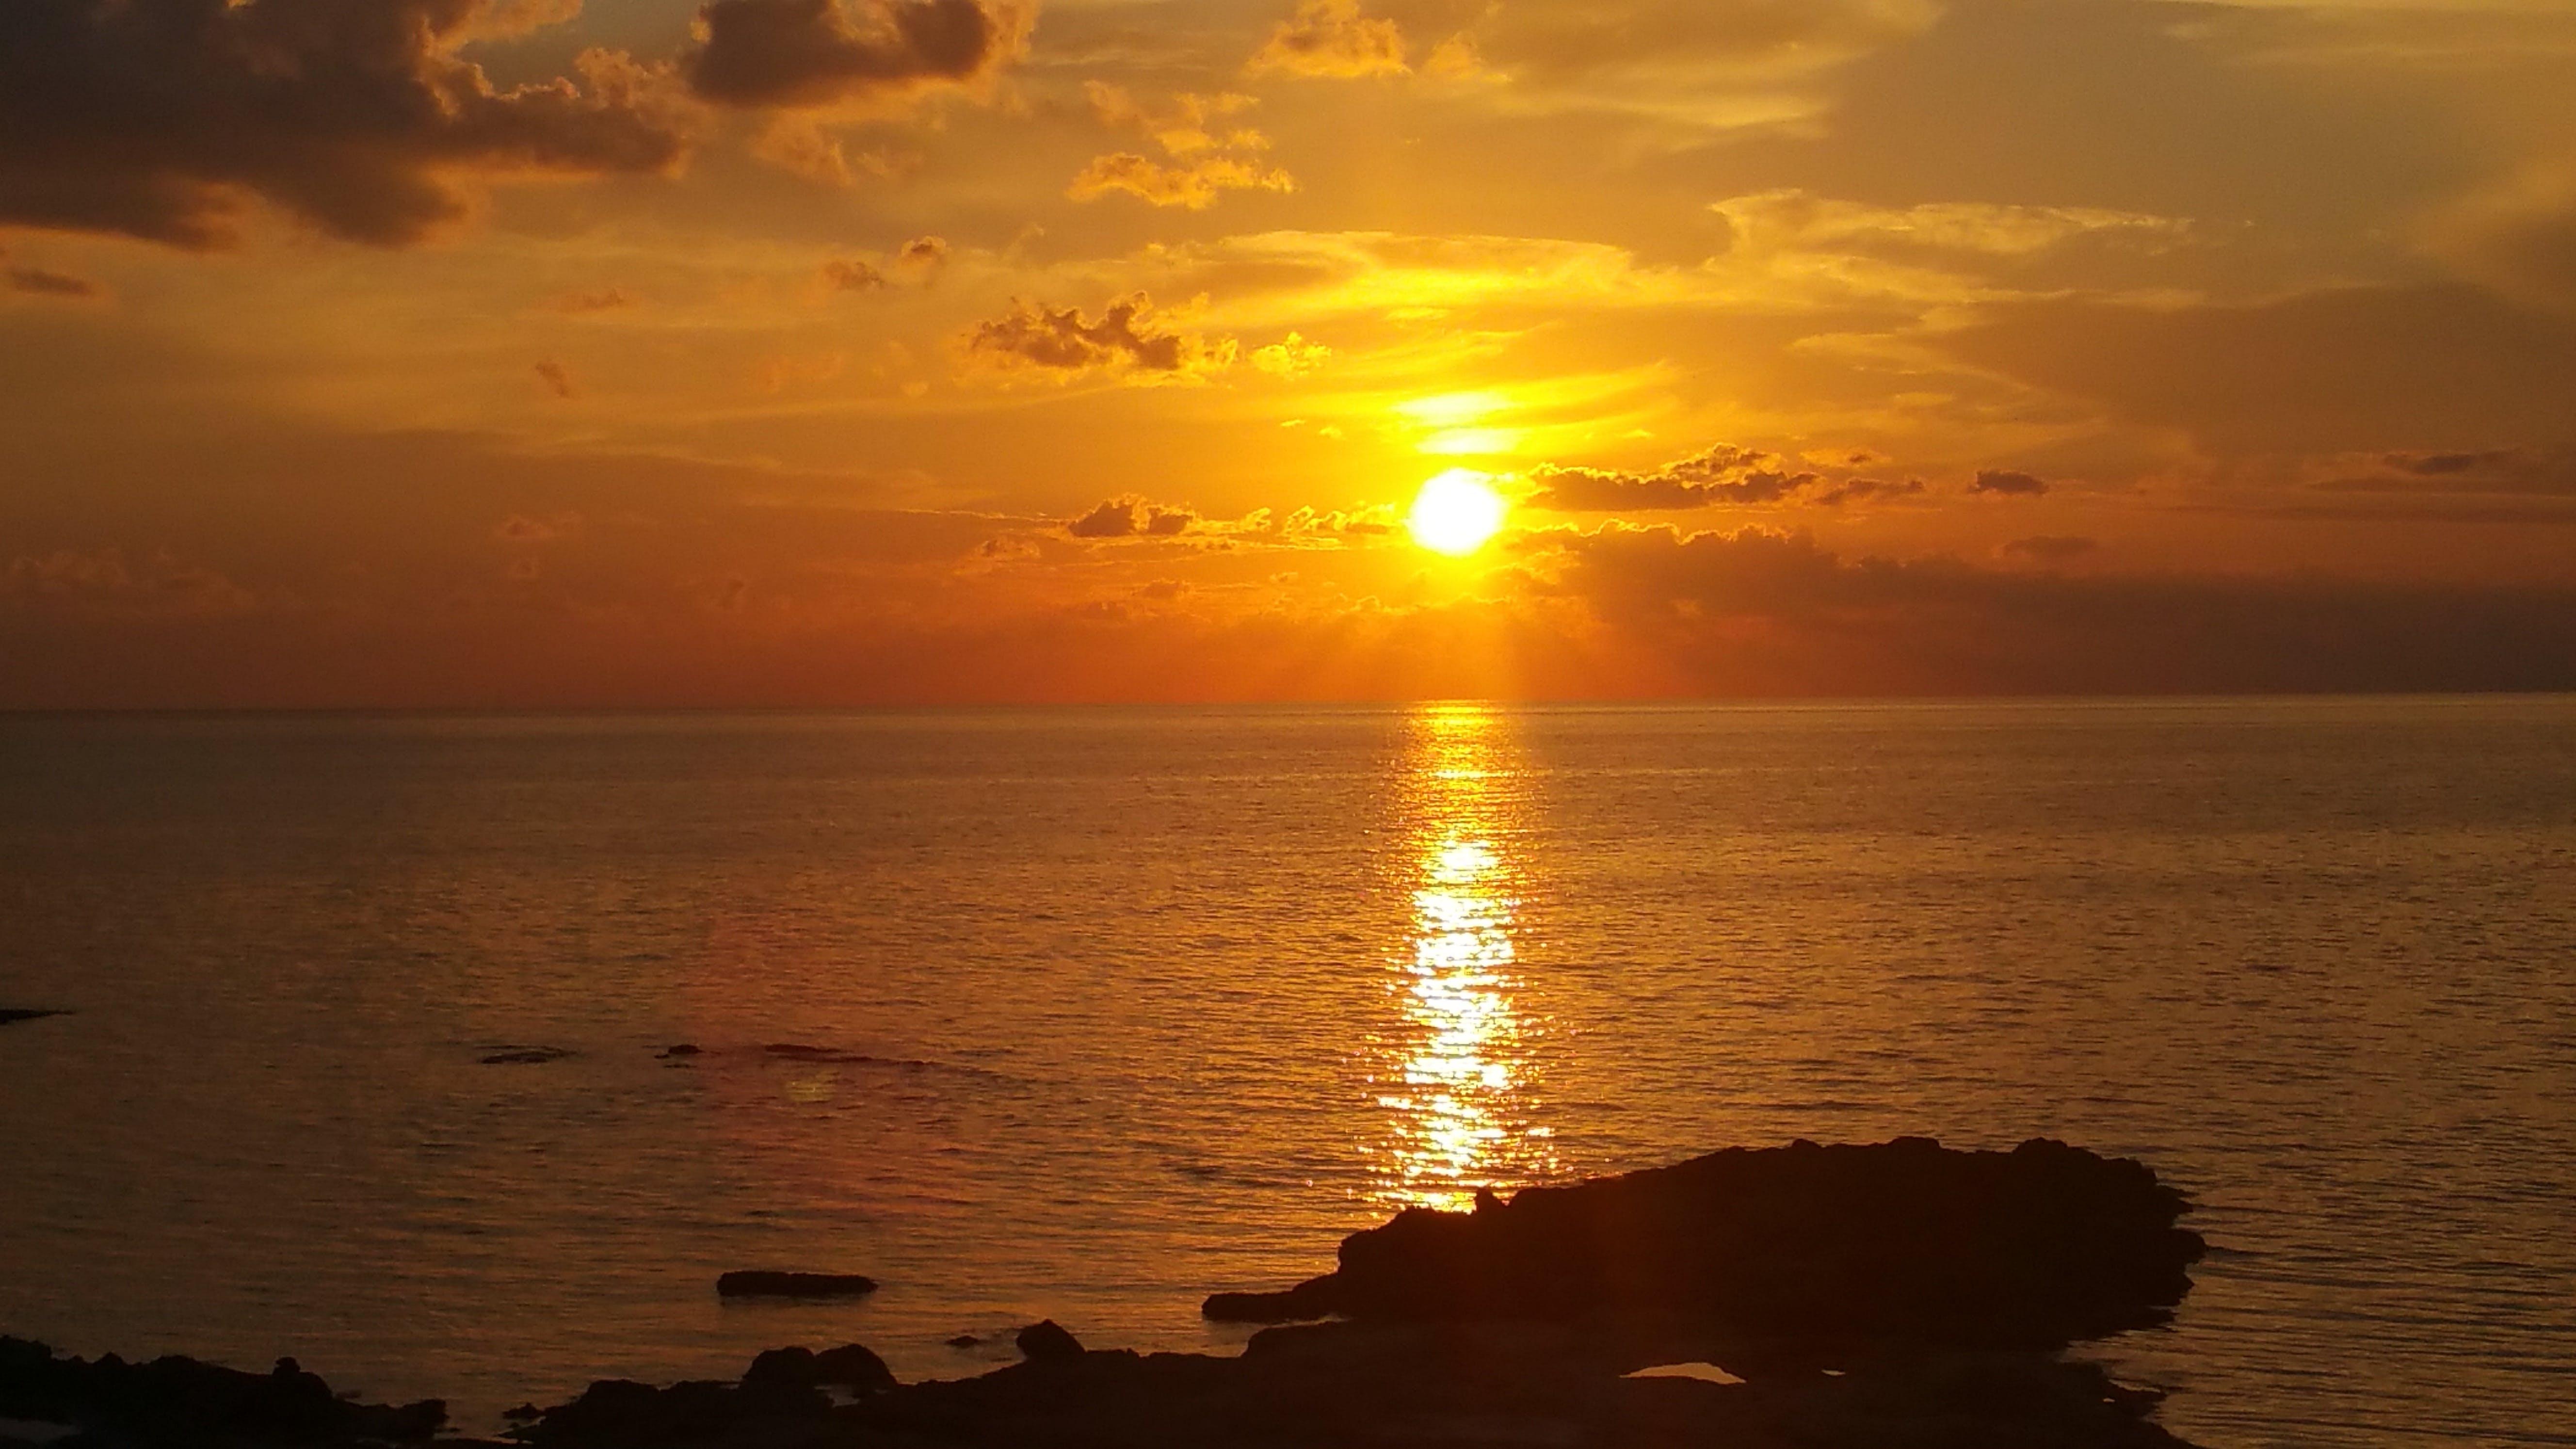 Free stock photo of sea, sunset, beach, holiday